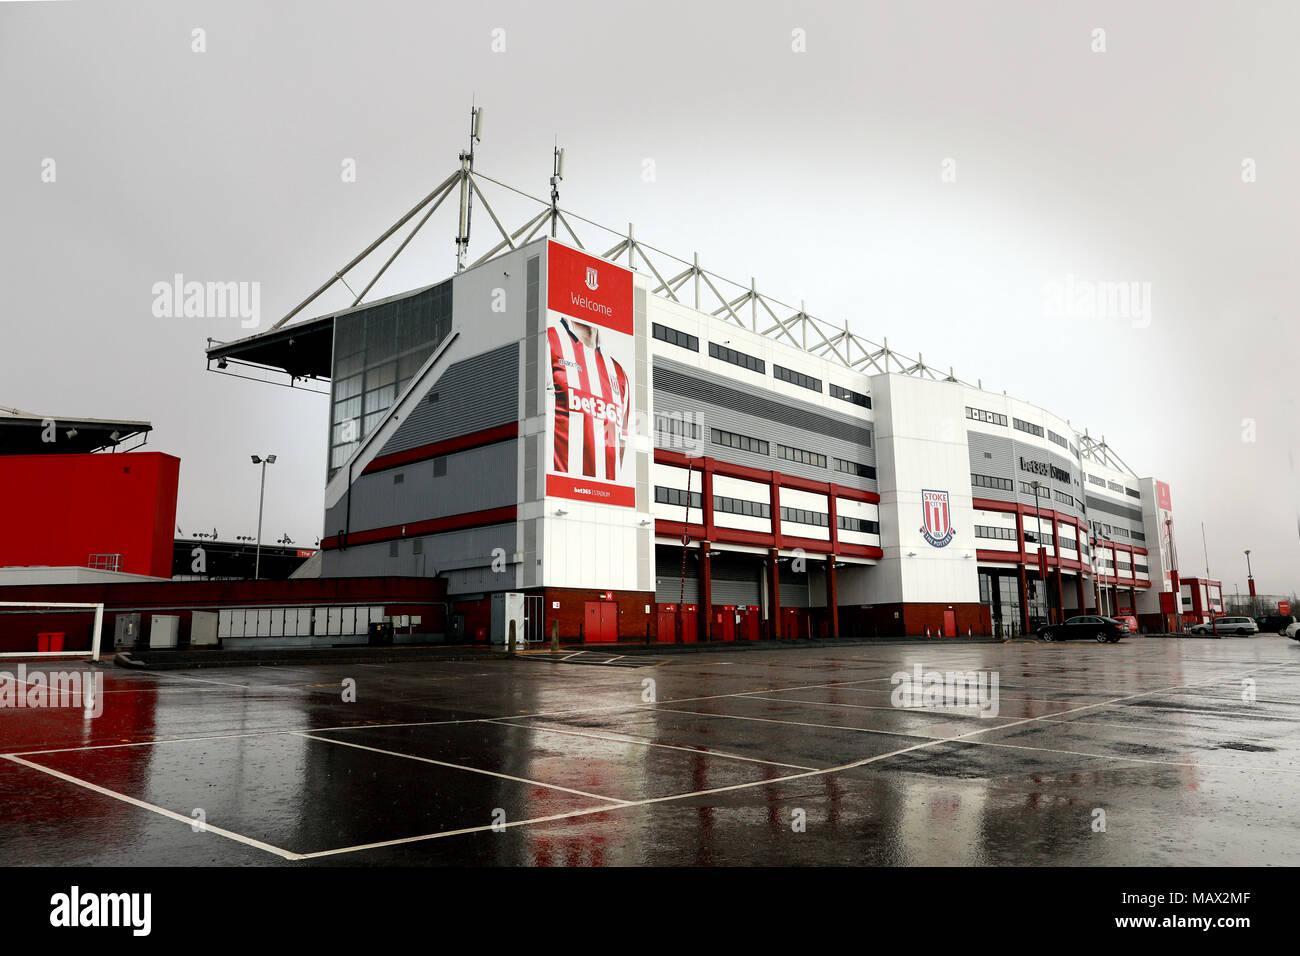 The Bet 365 Stadium, home of Stoke City Football Club - Stock Image